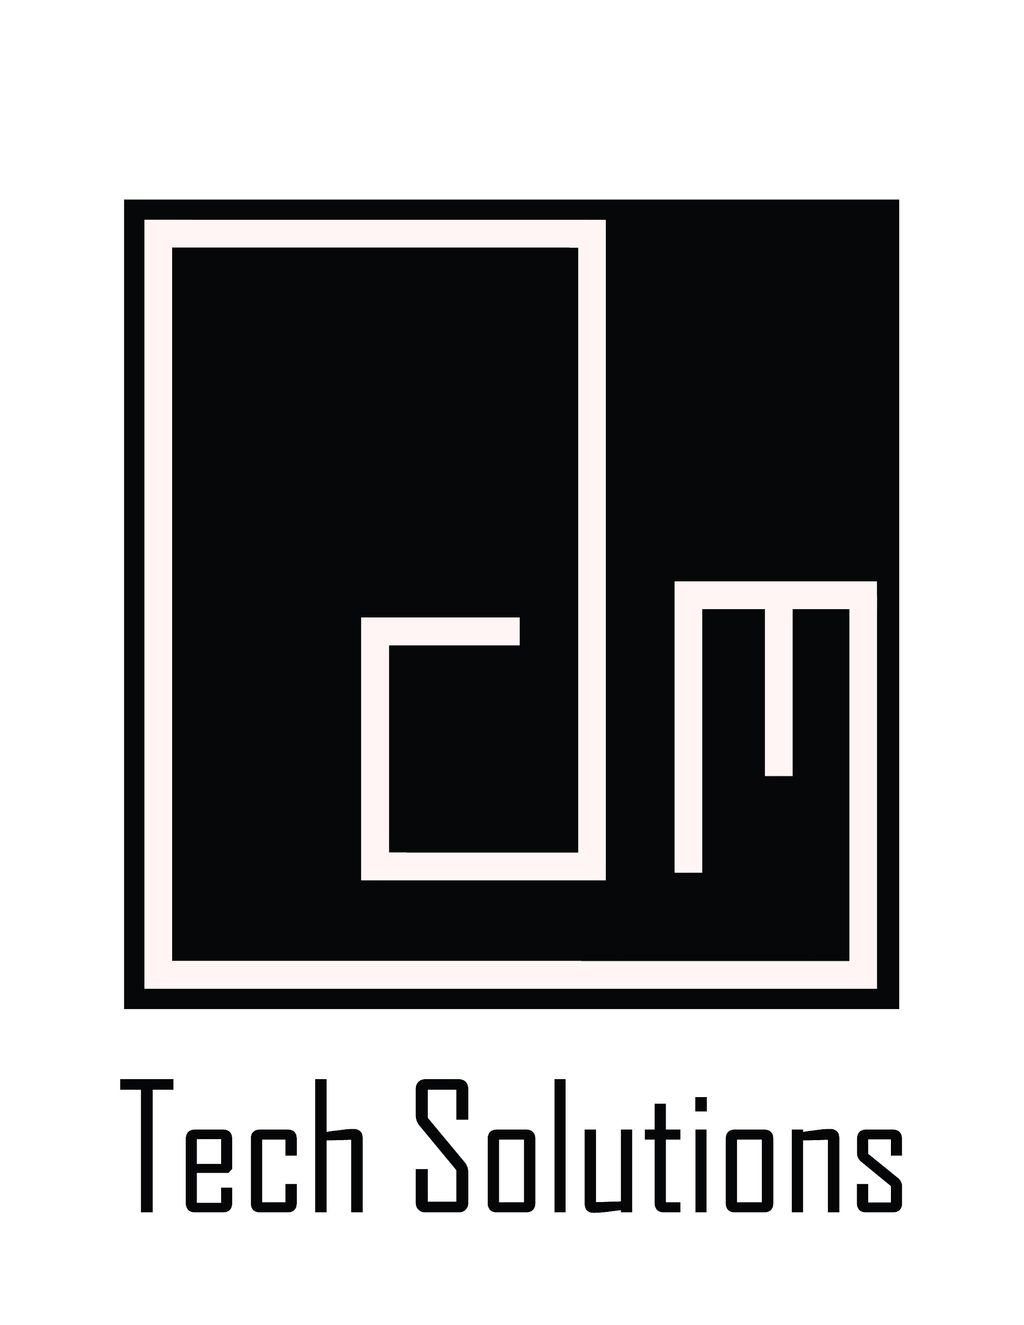 DM TECH Solutions